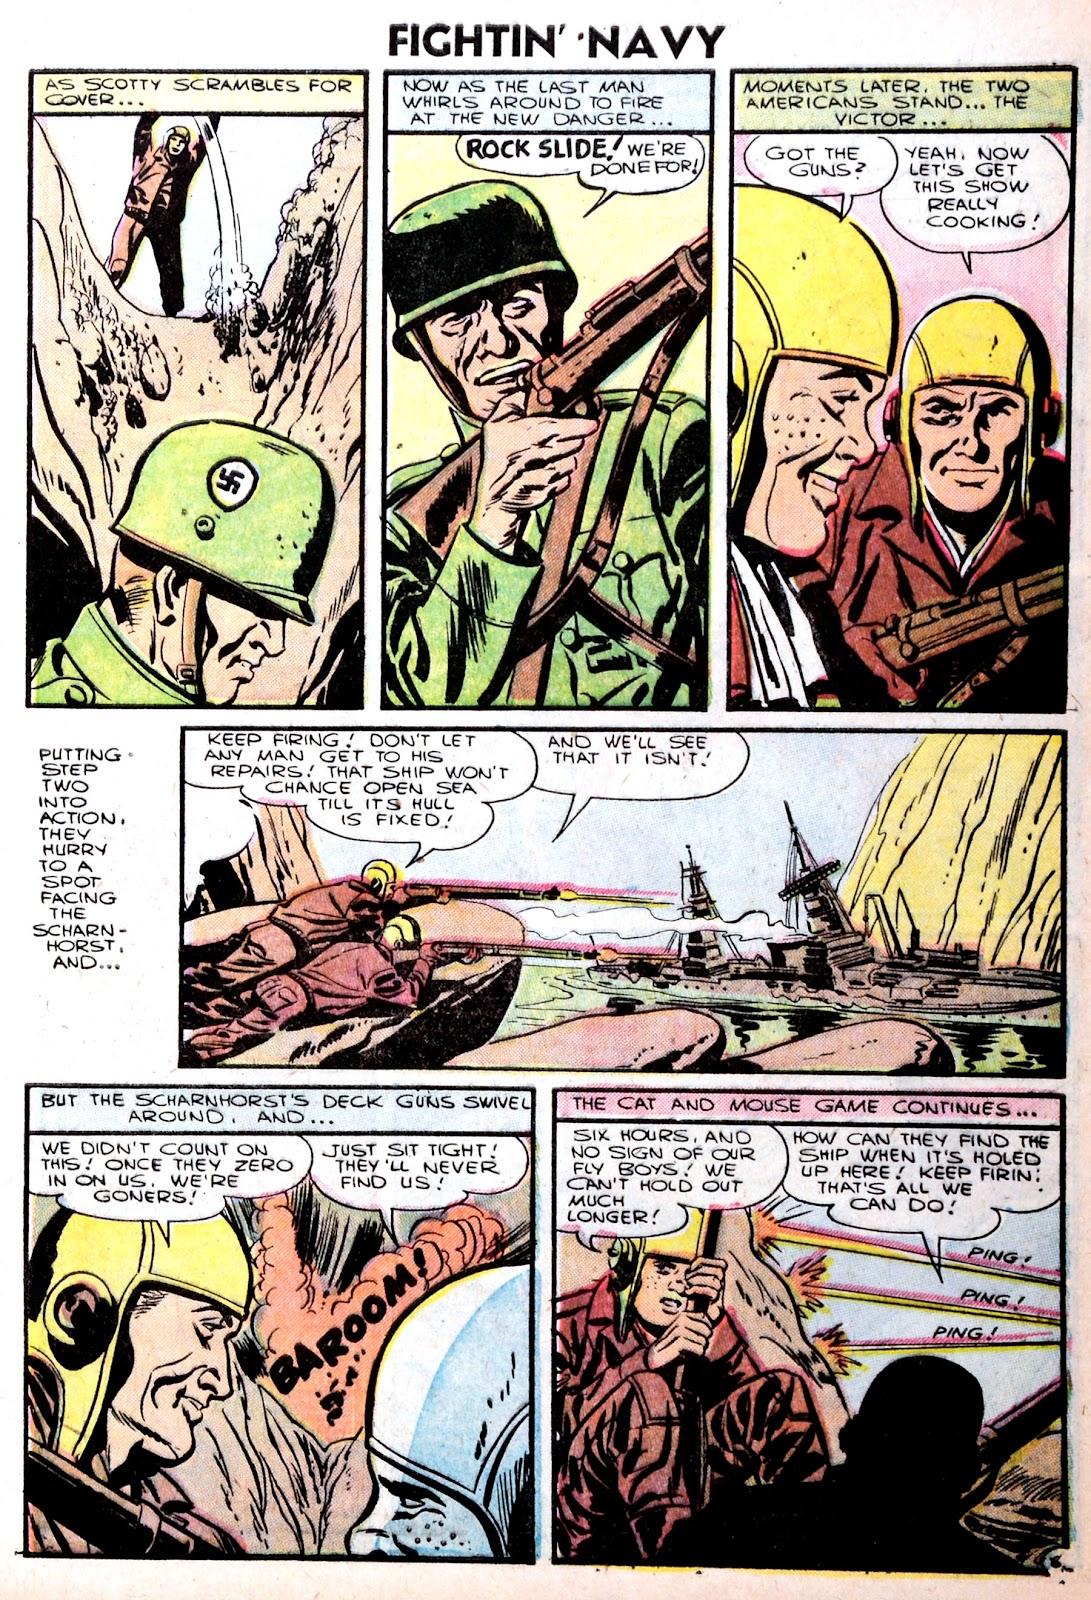 Read online Fightin' Navy comic -  Issue #75 - 9